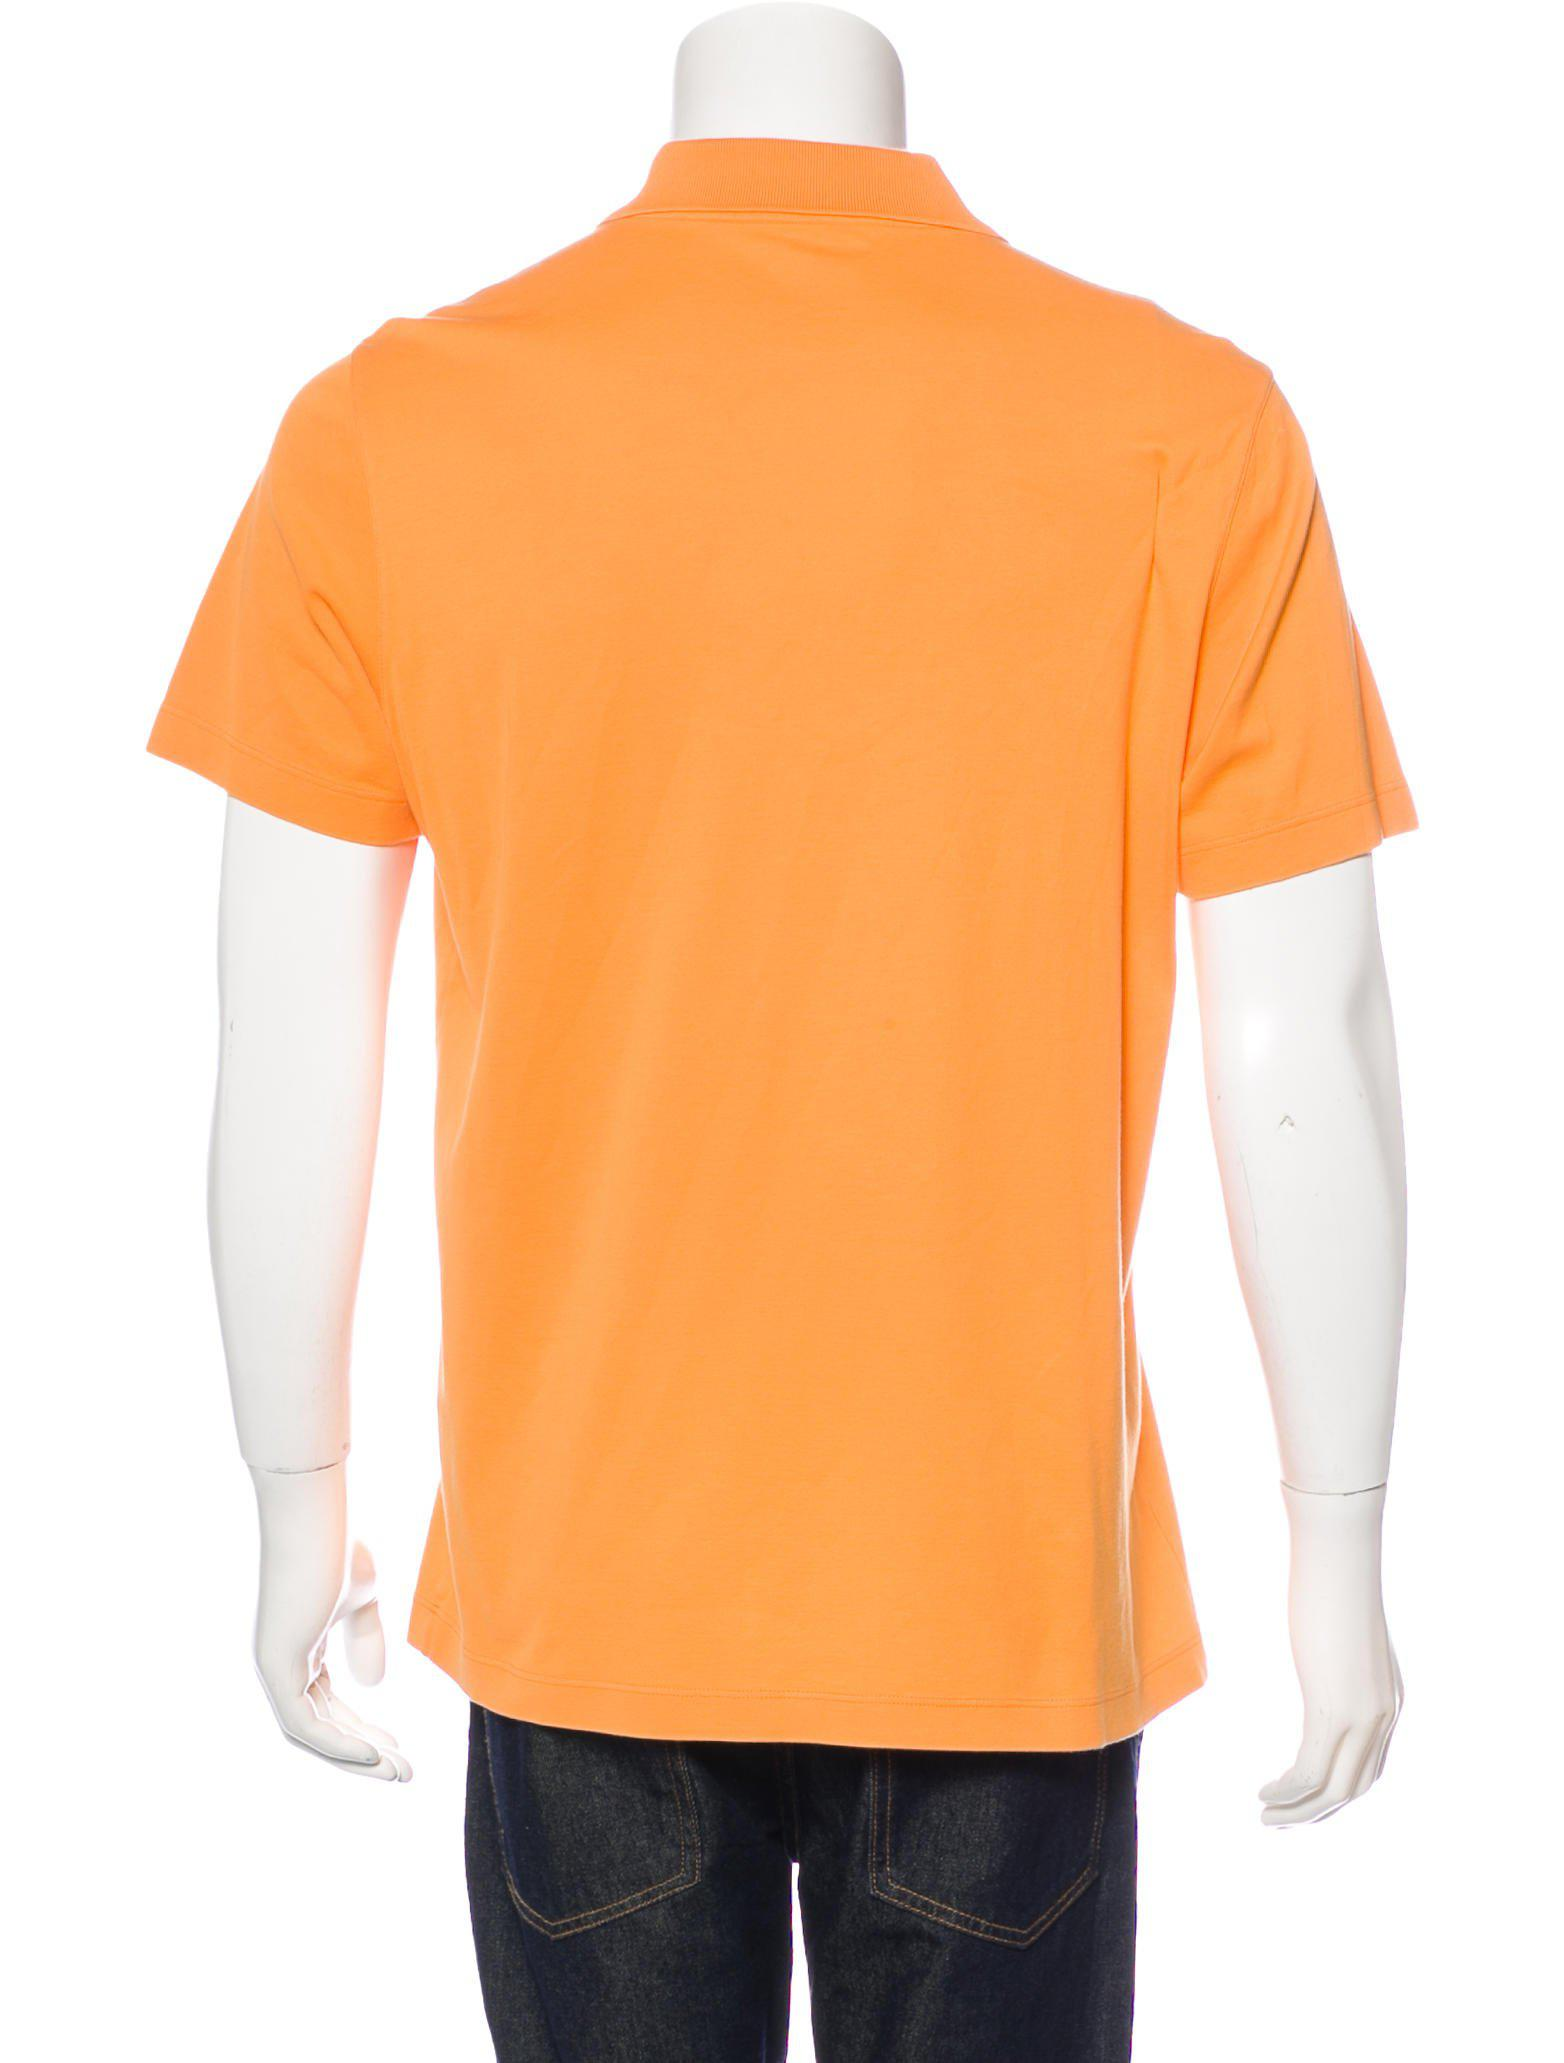 Louis Vuitton Collar Shirt T Shirts Design Concept